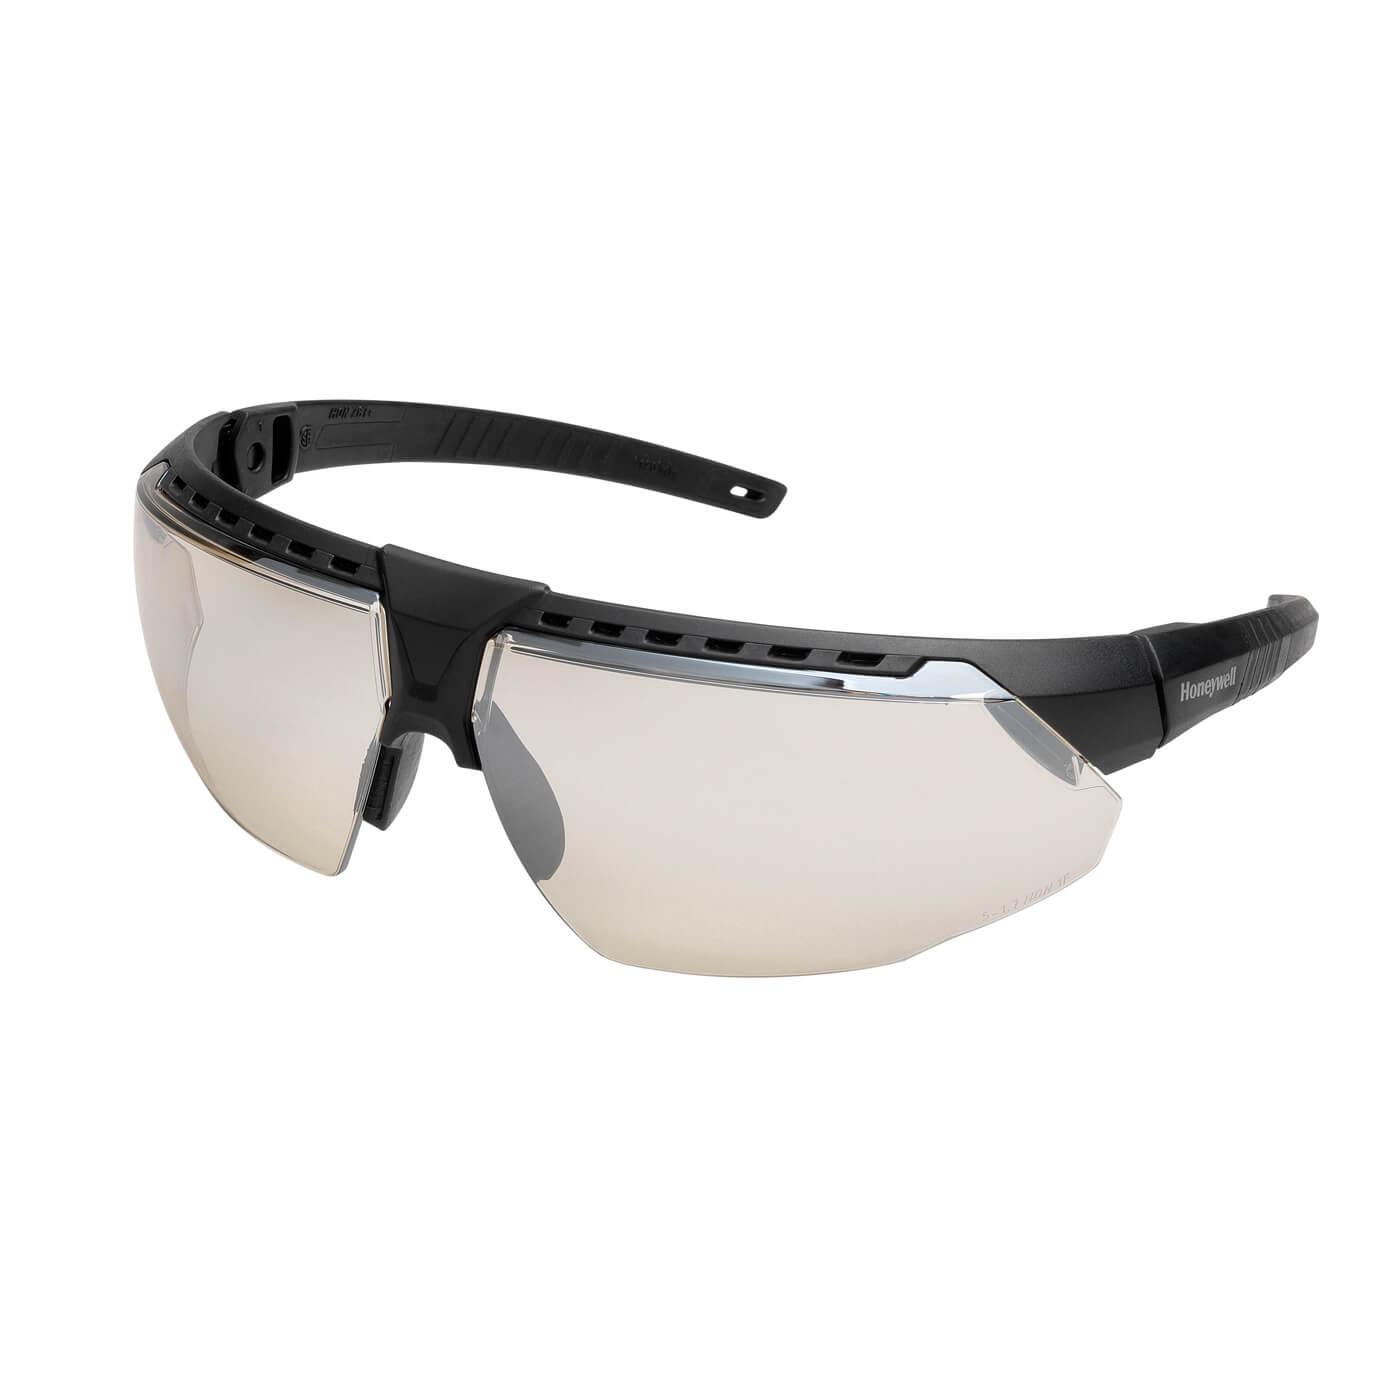 Okulary ochronne Avatar 1034834 Honeywell lustrzana soczewka